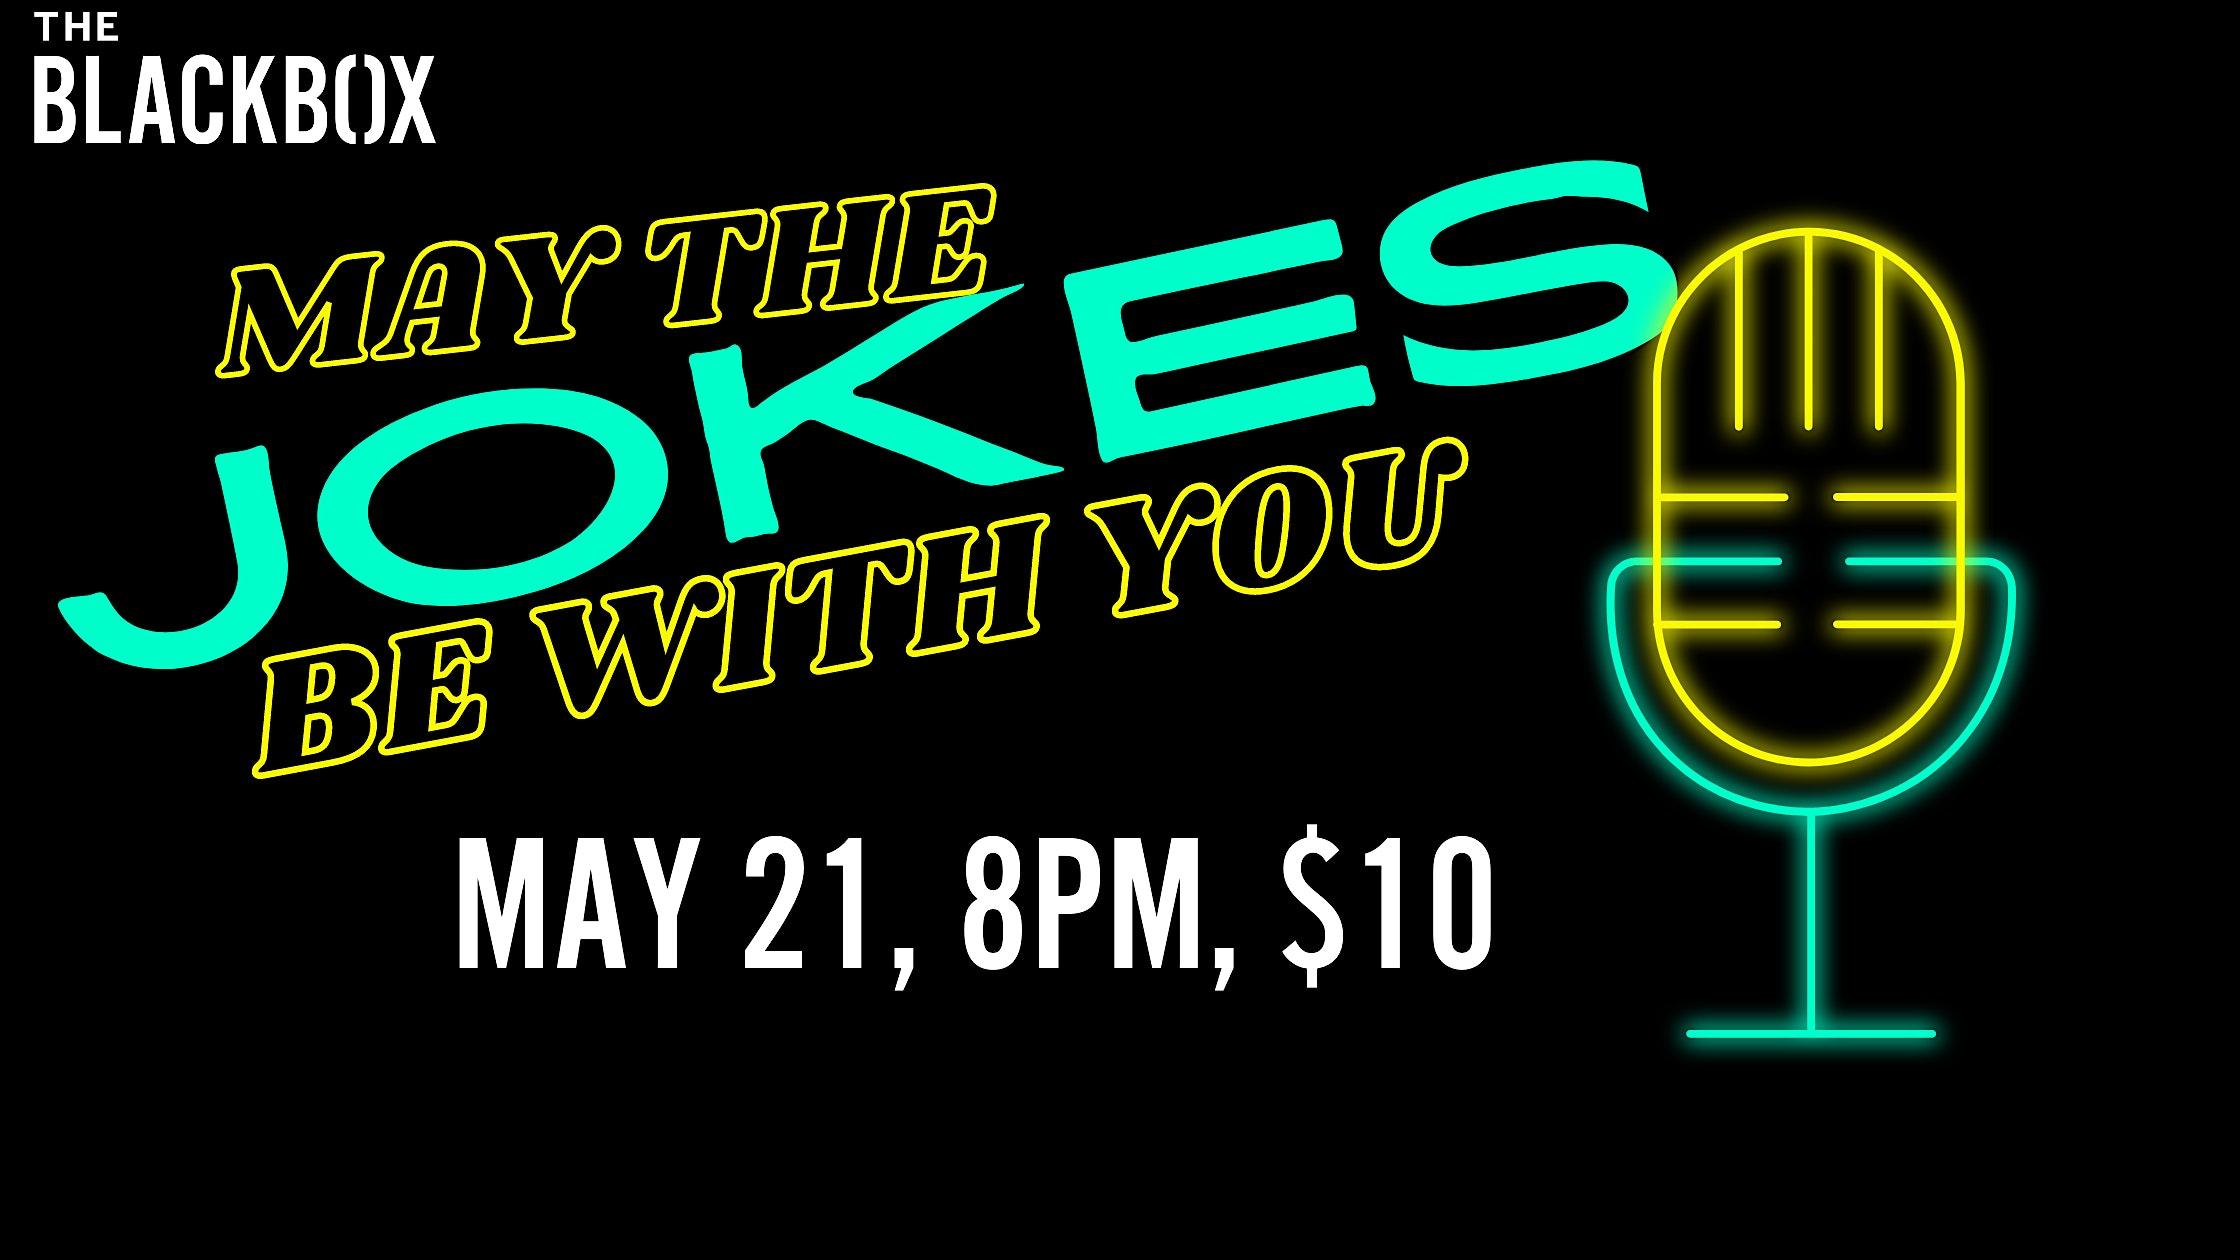 FRI, MAY 21, 2021 - MAY The Jokes Be With You!